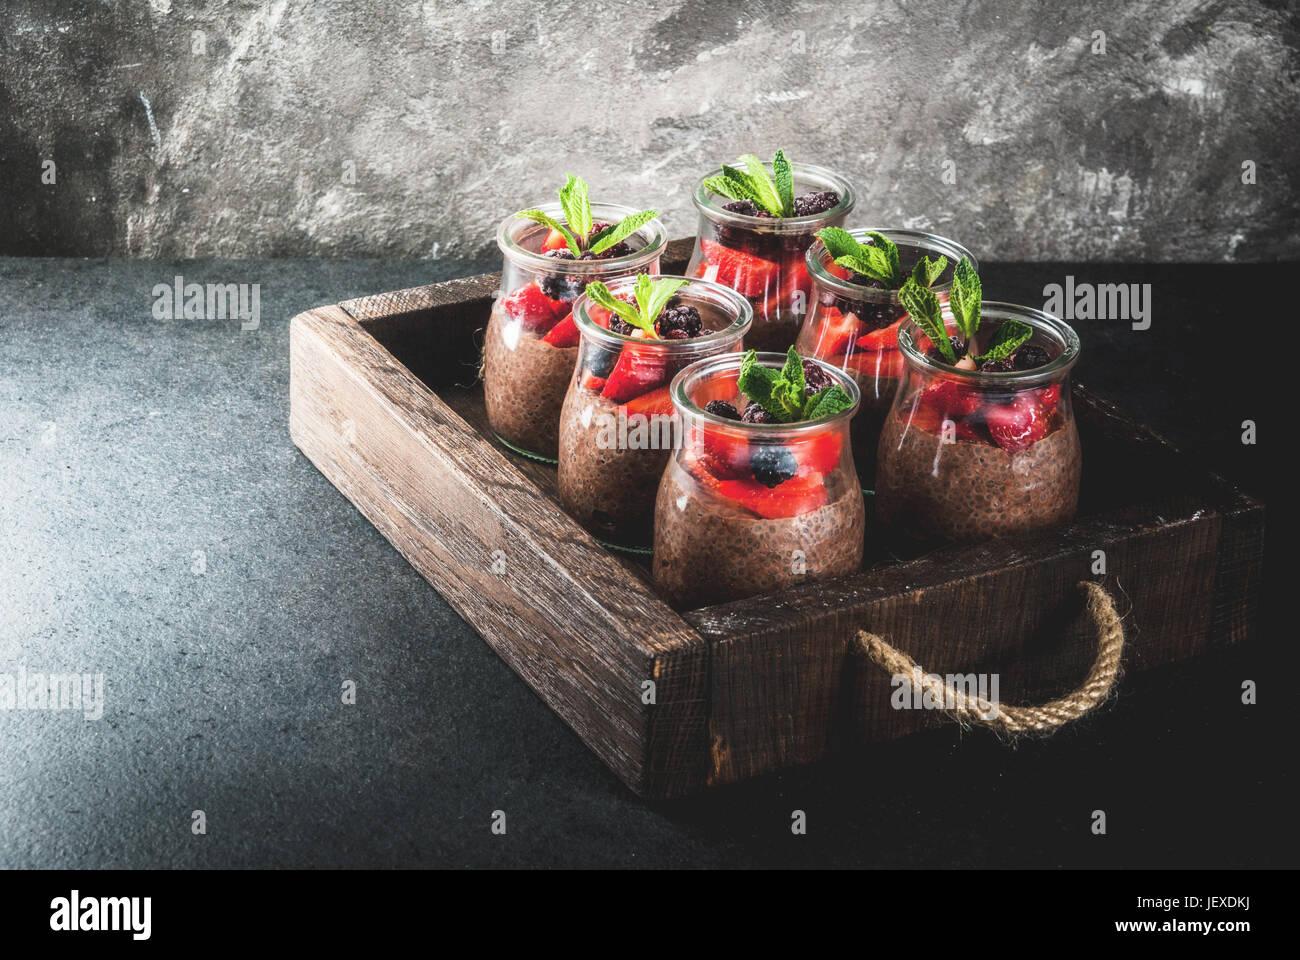 Healthy vegan breakfast. Dessert. Alternative food. Pudding with chia seeds, fresh strawberries, blackberries and - Stock Image